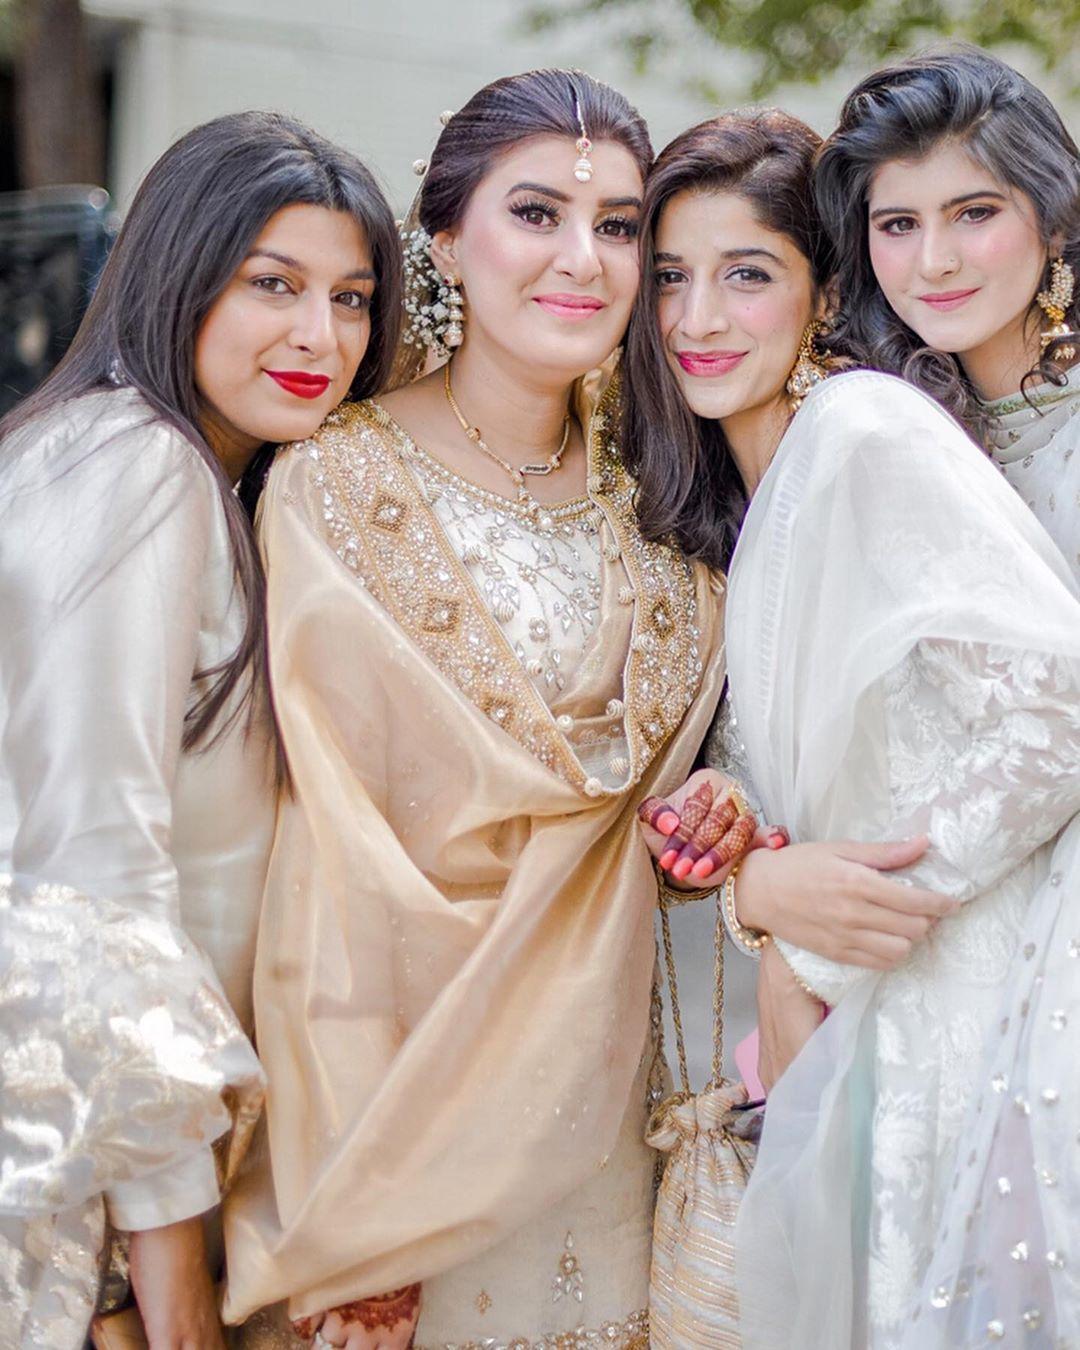 Beautiful Mawra Hocane at her Best Friend's Nikah Event